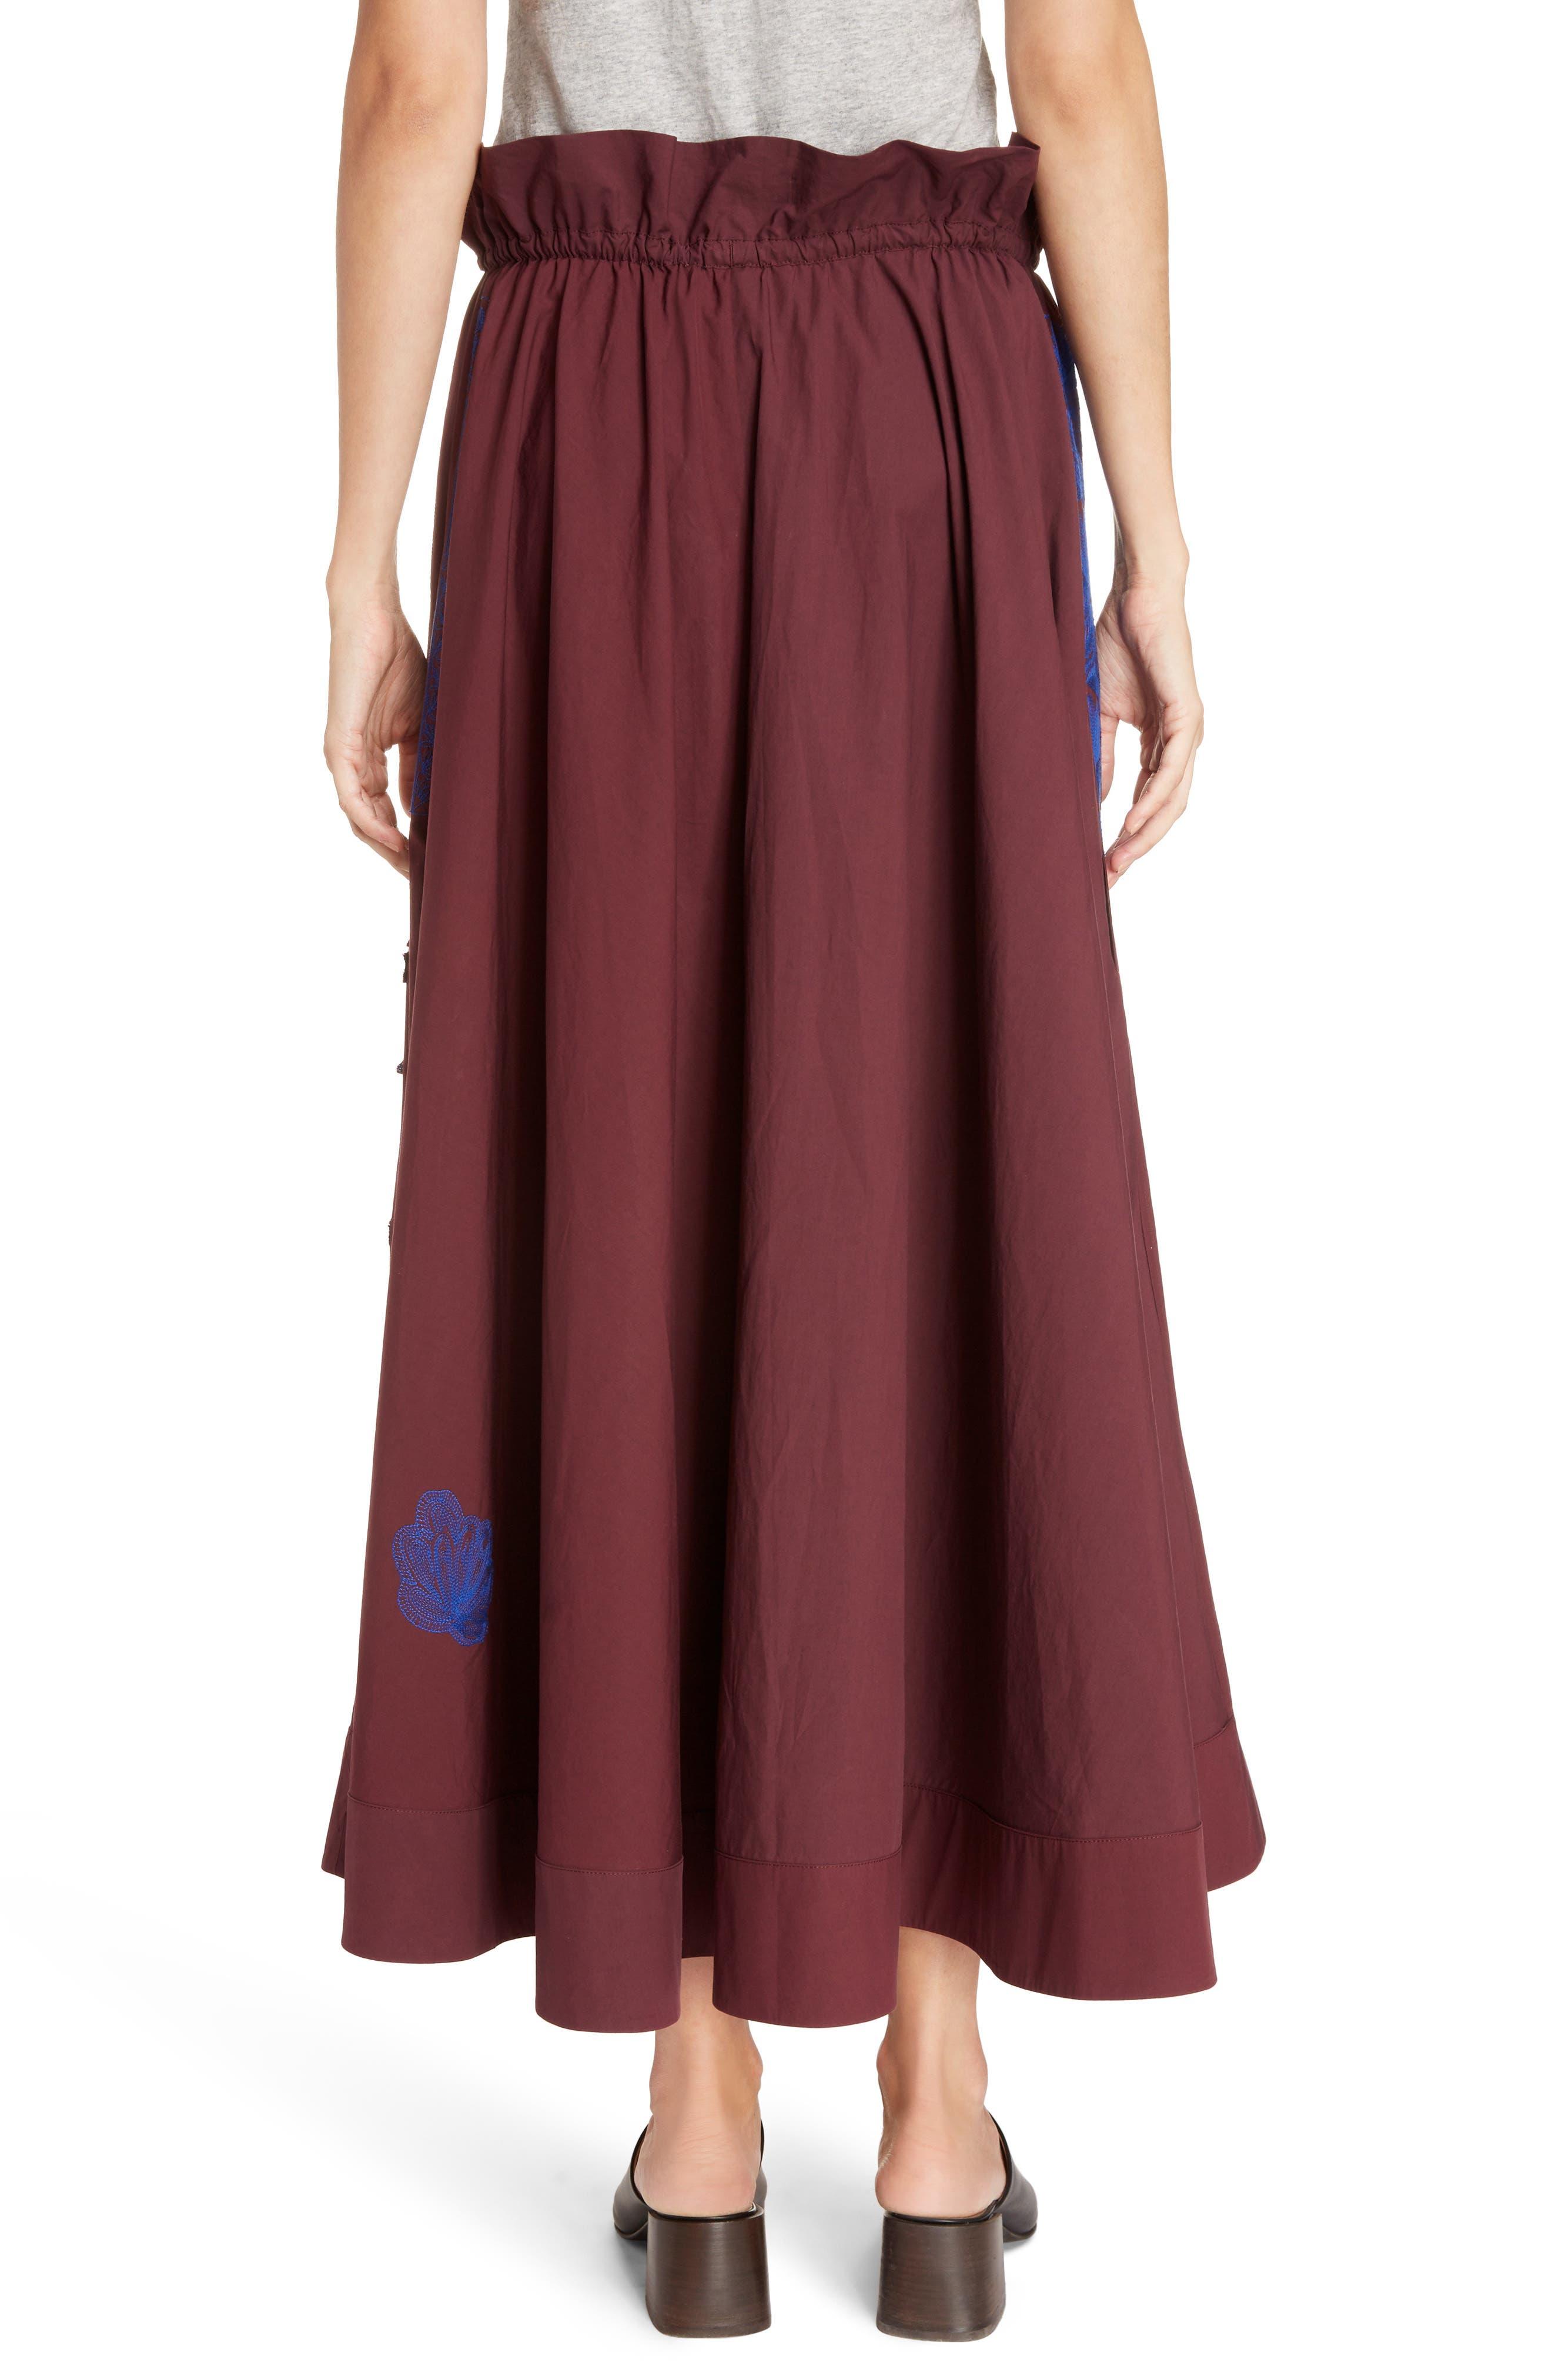 Hela Tie Waist Skirt,                             Alternate thumbnail 2, color,                             930